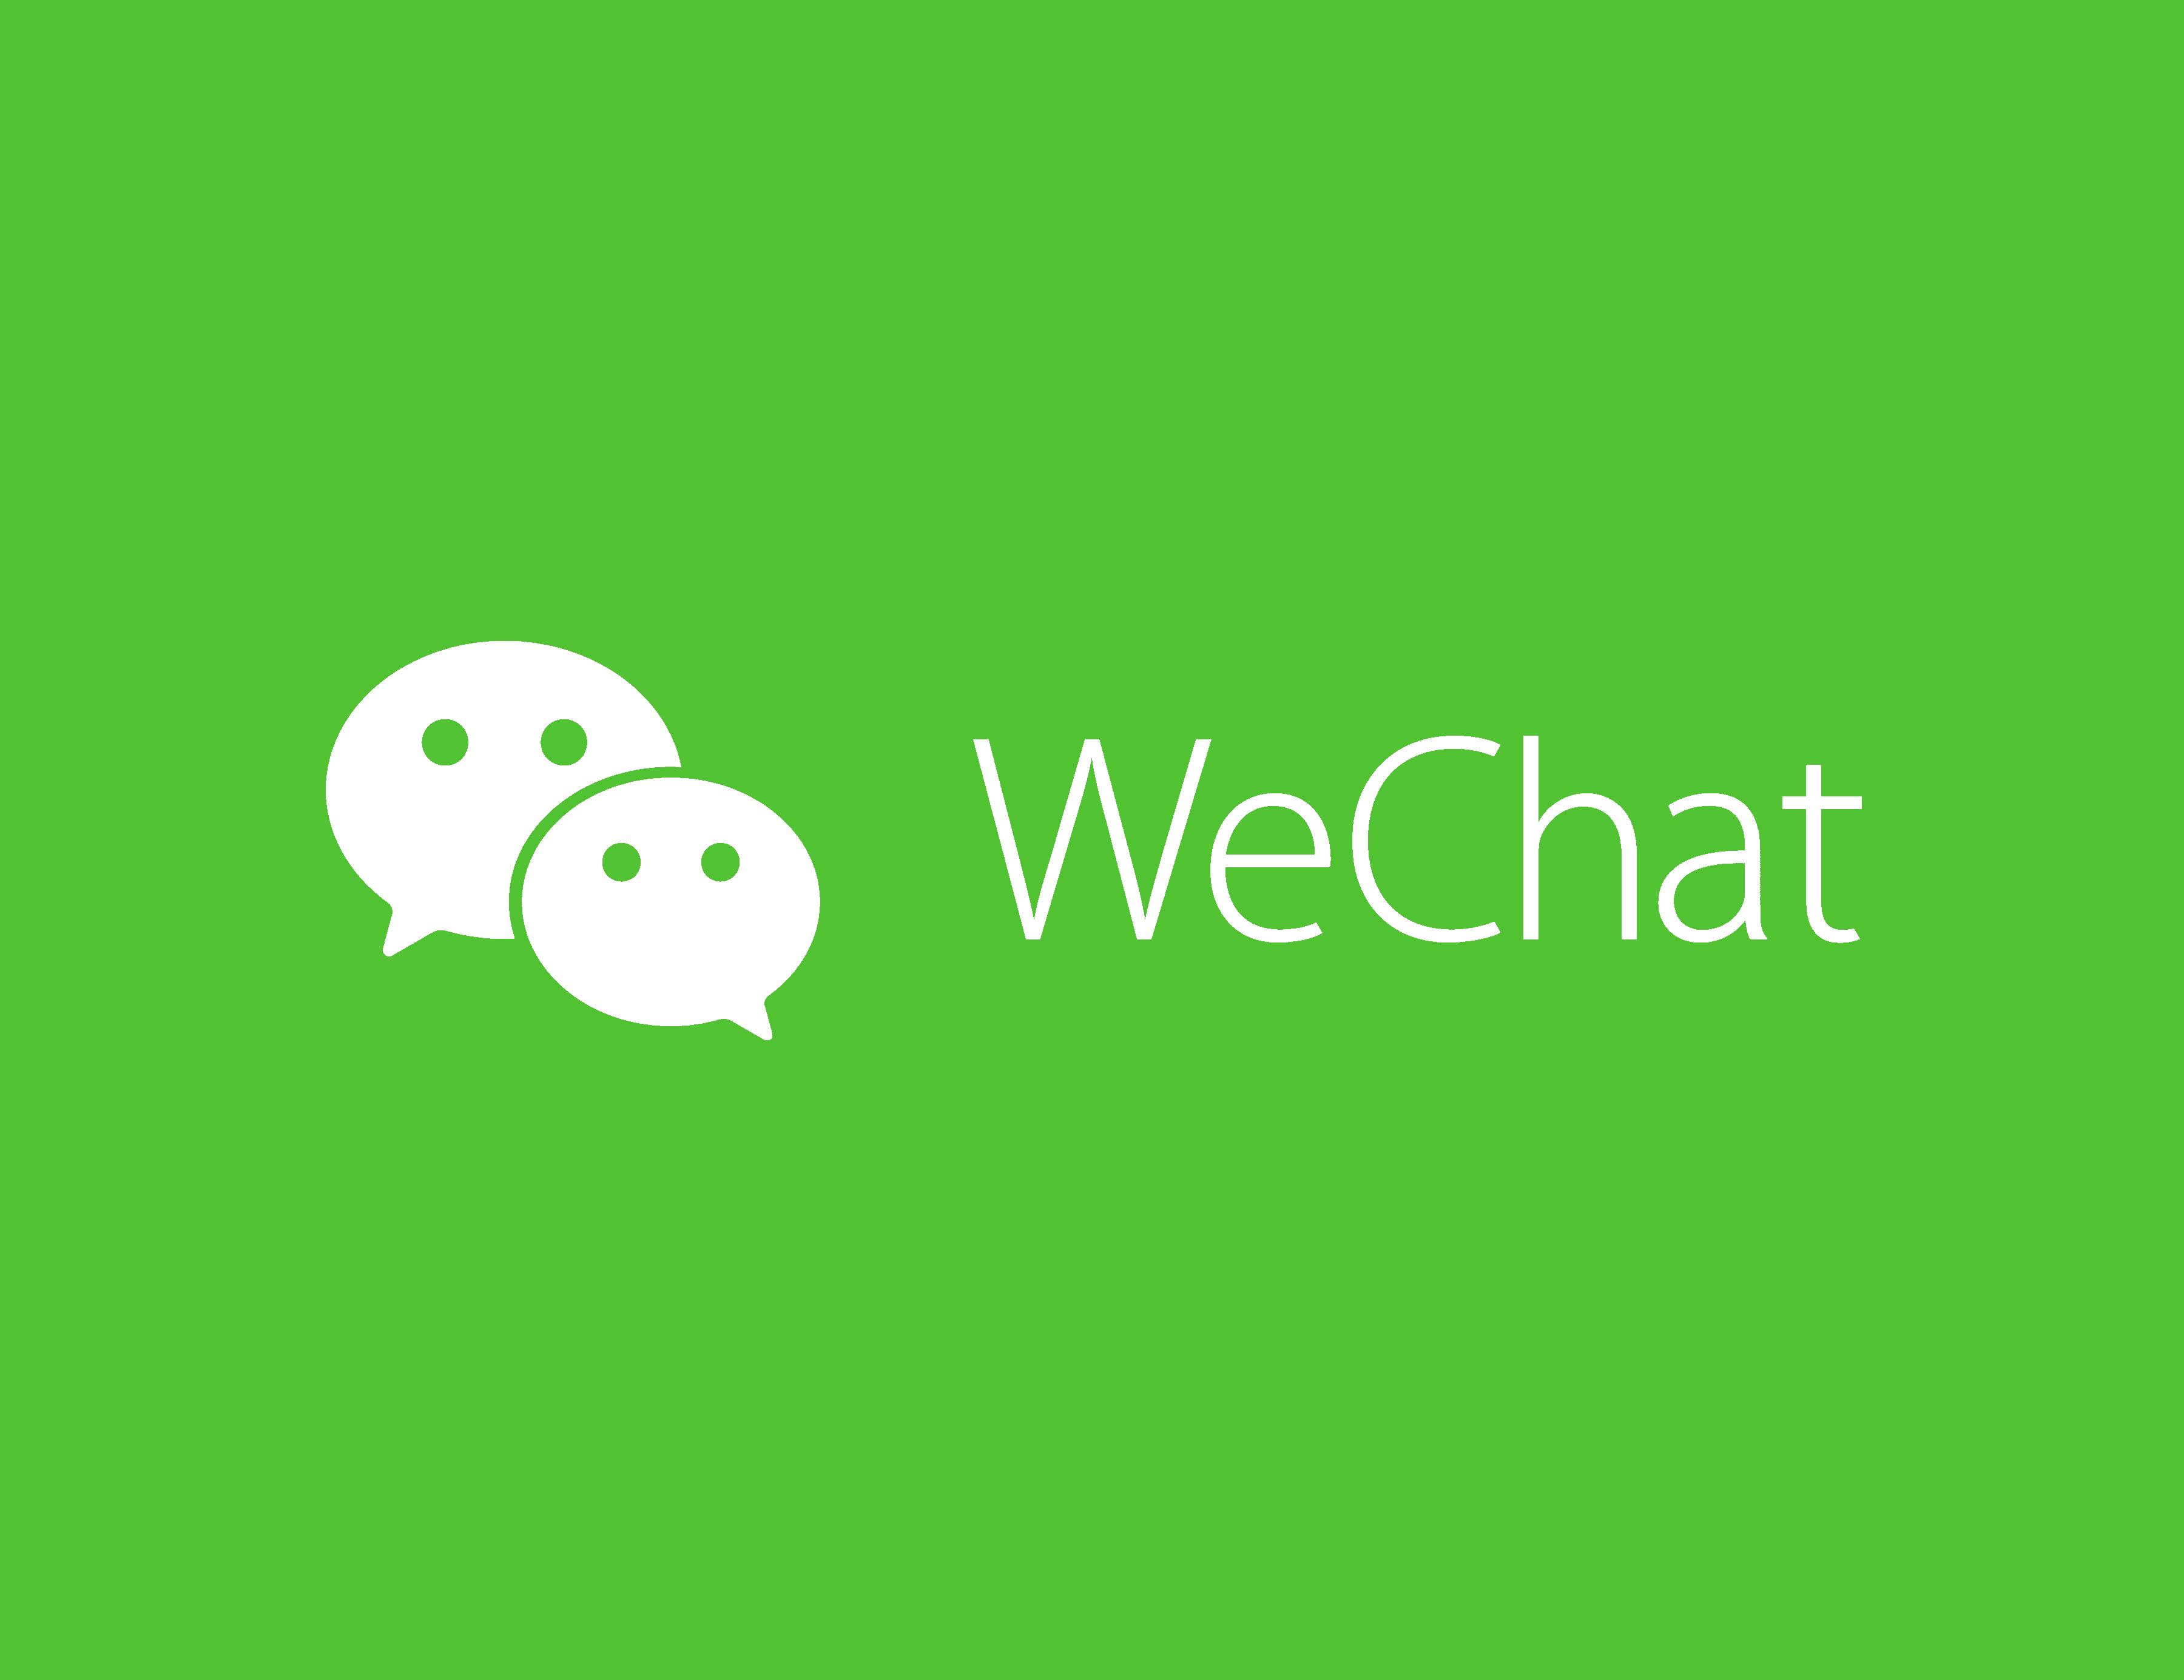 wechat logo online shop logo inspiration logojoy